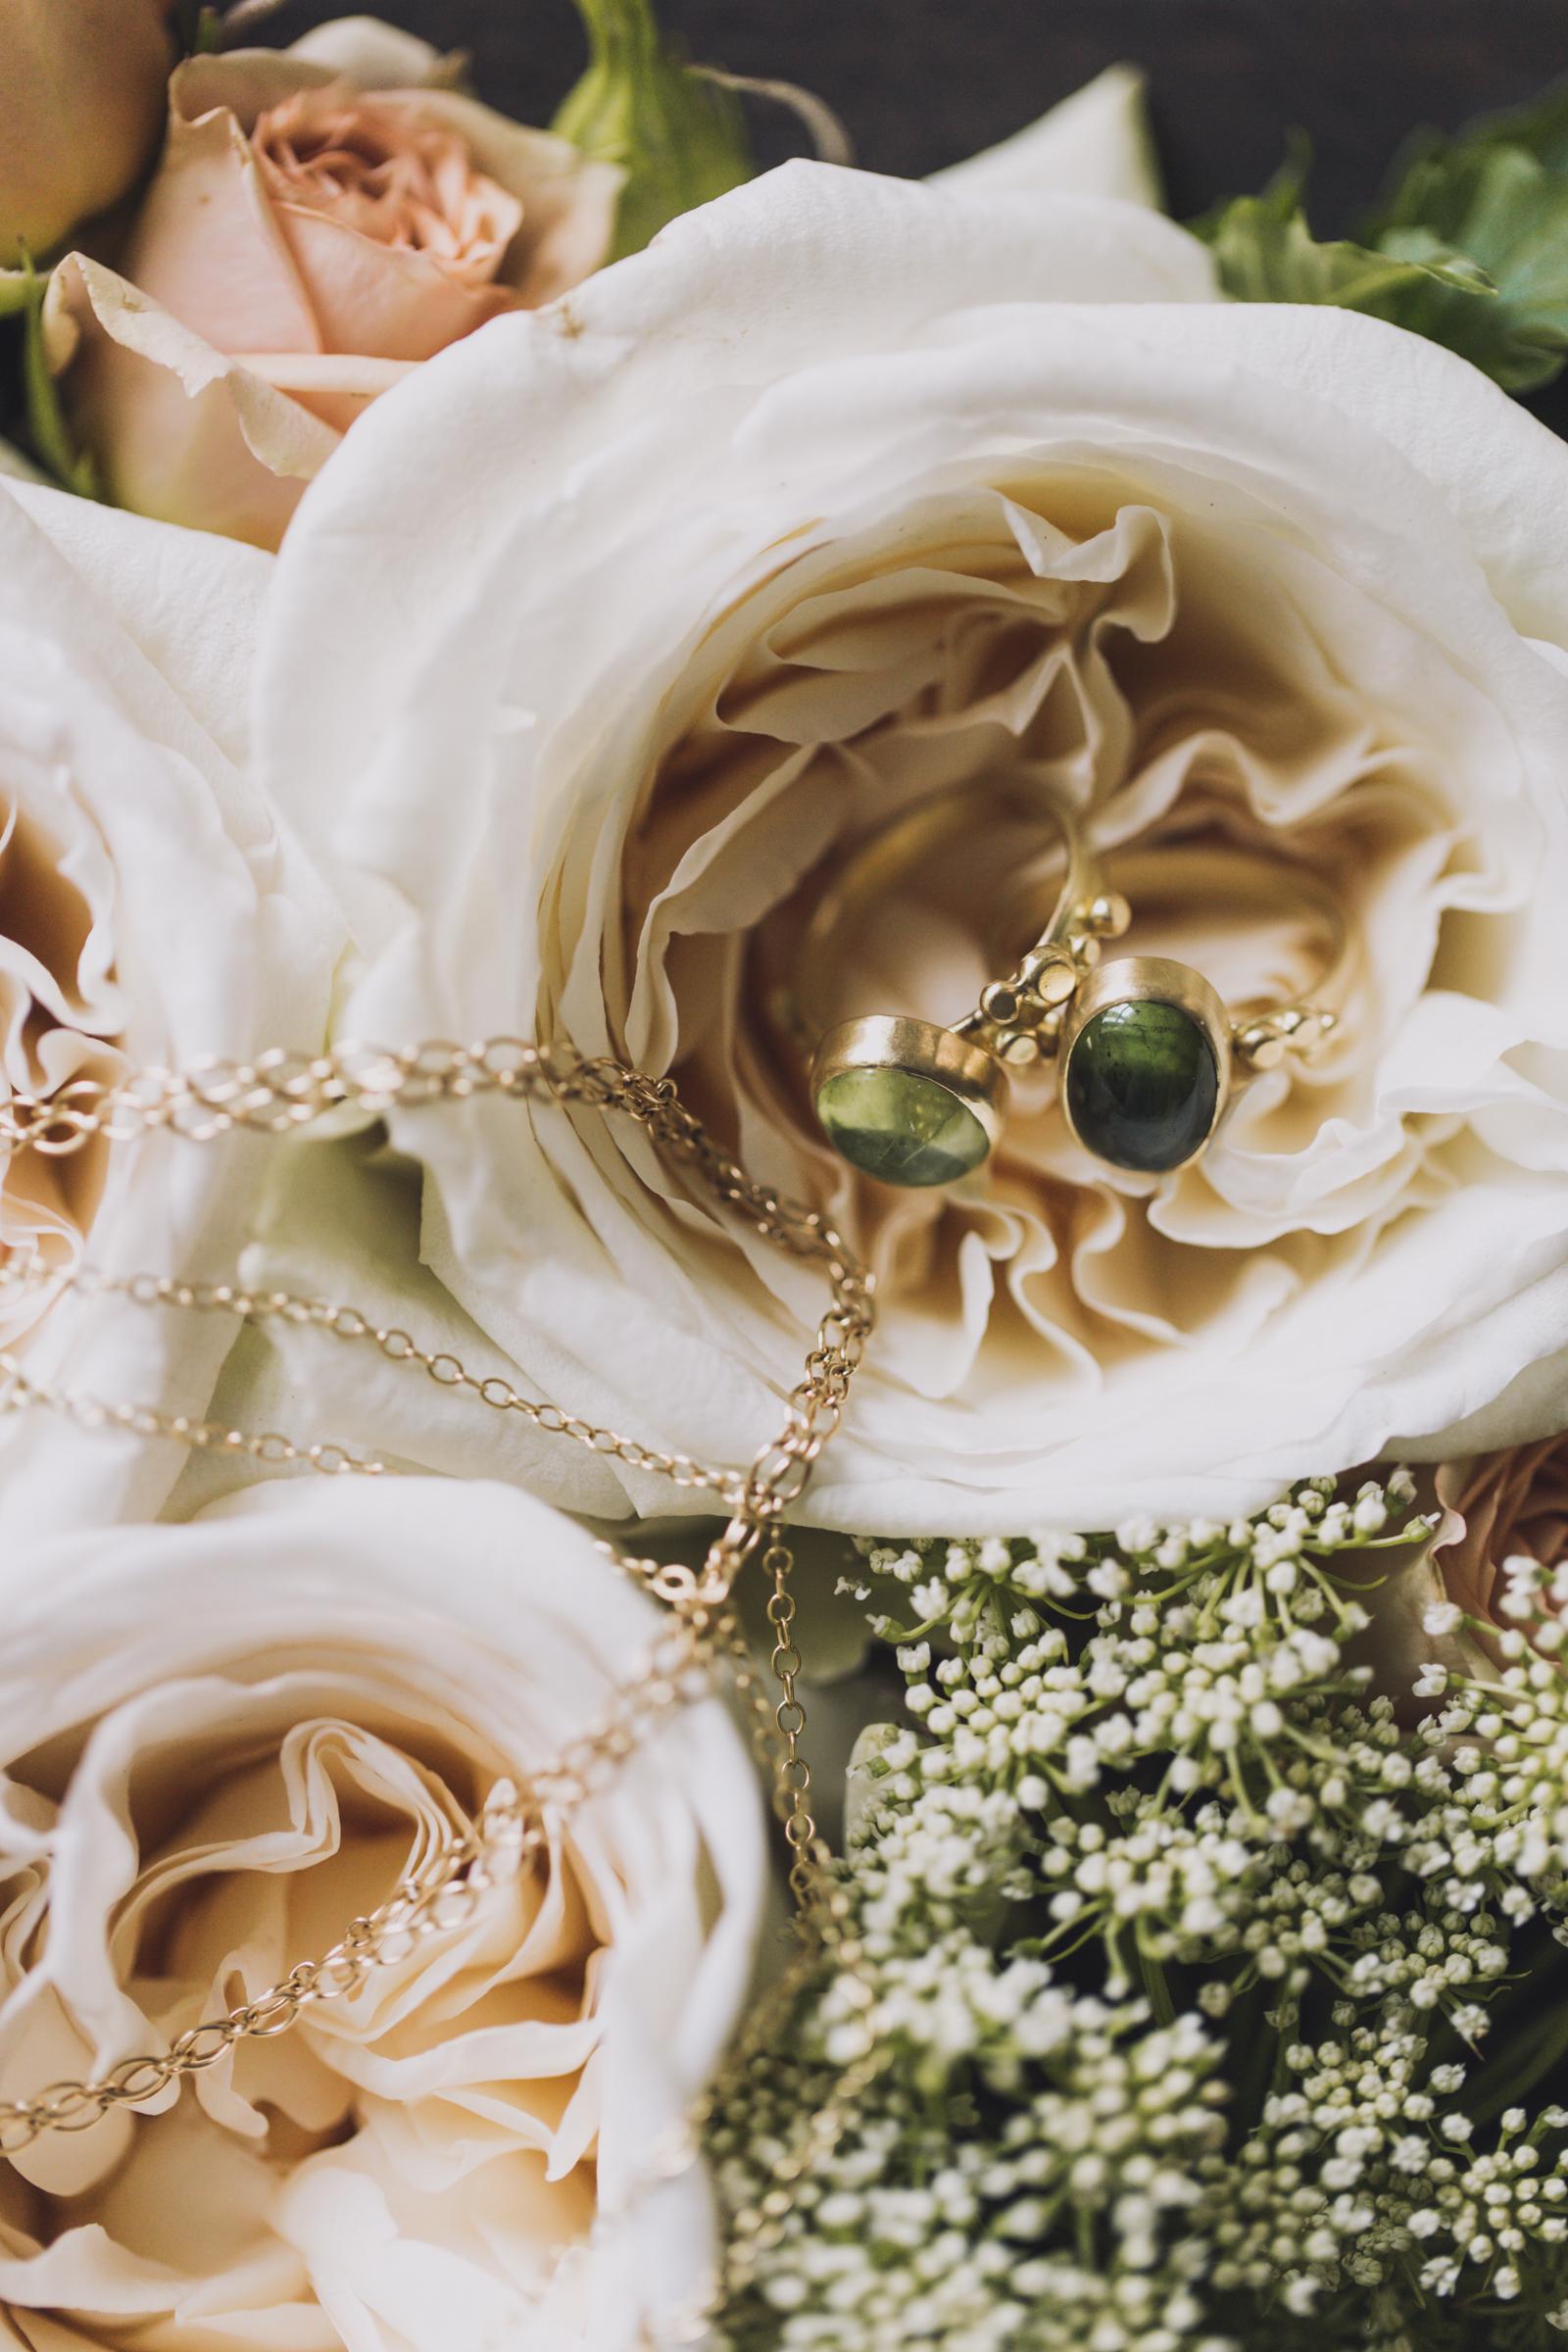 20160310-059-Barrow_Mansion_Wedding_Editorial.jpg